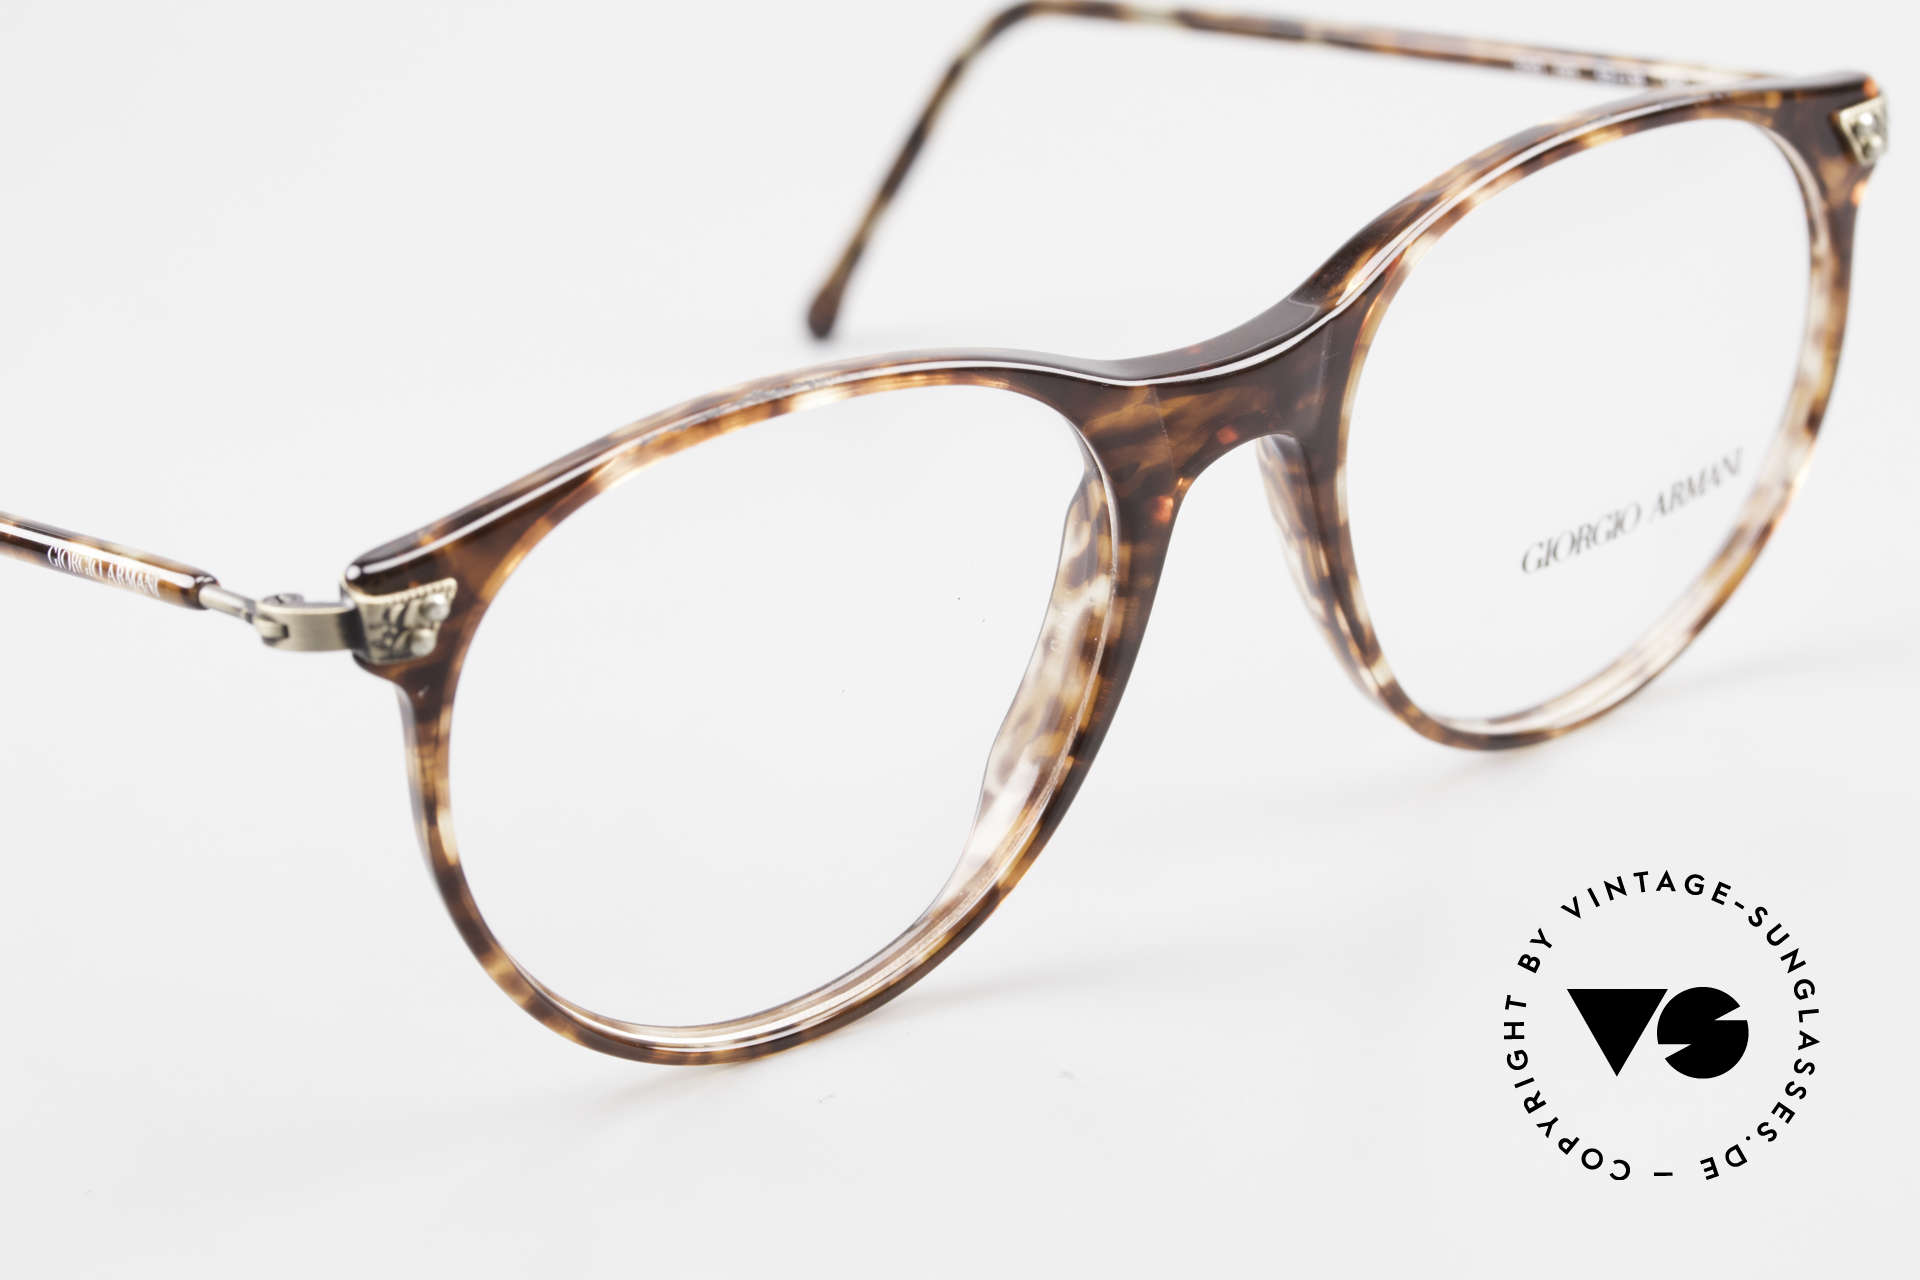 Giorgio Armani 330 True Vintage Unisex Glasses, unworn (like all our vintage Giorgio Armani specs), Made for Men and Women